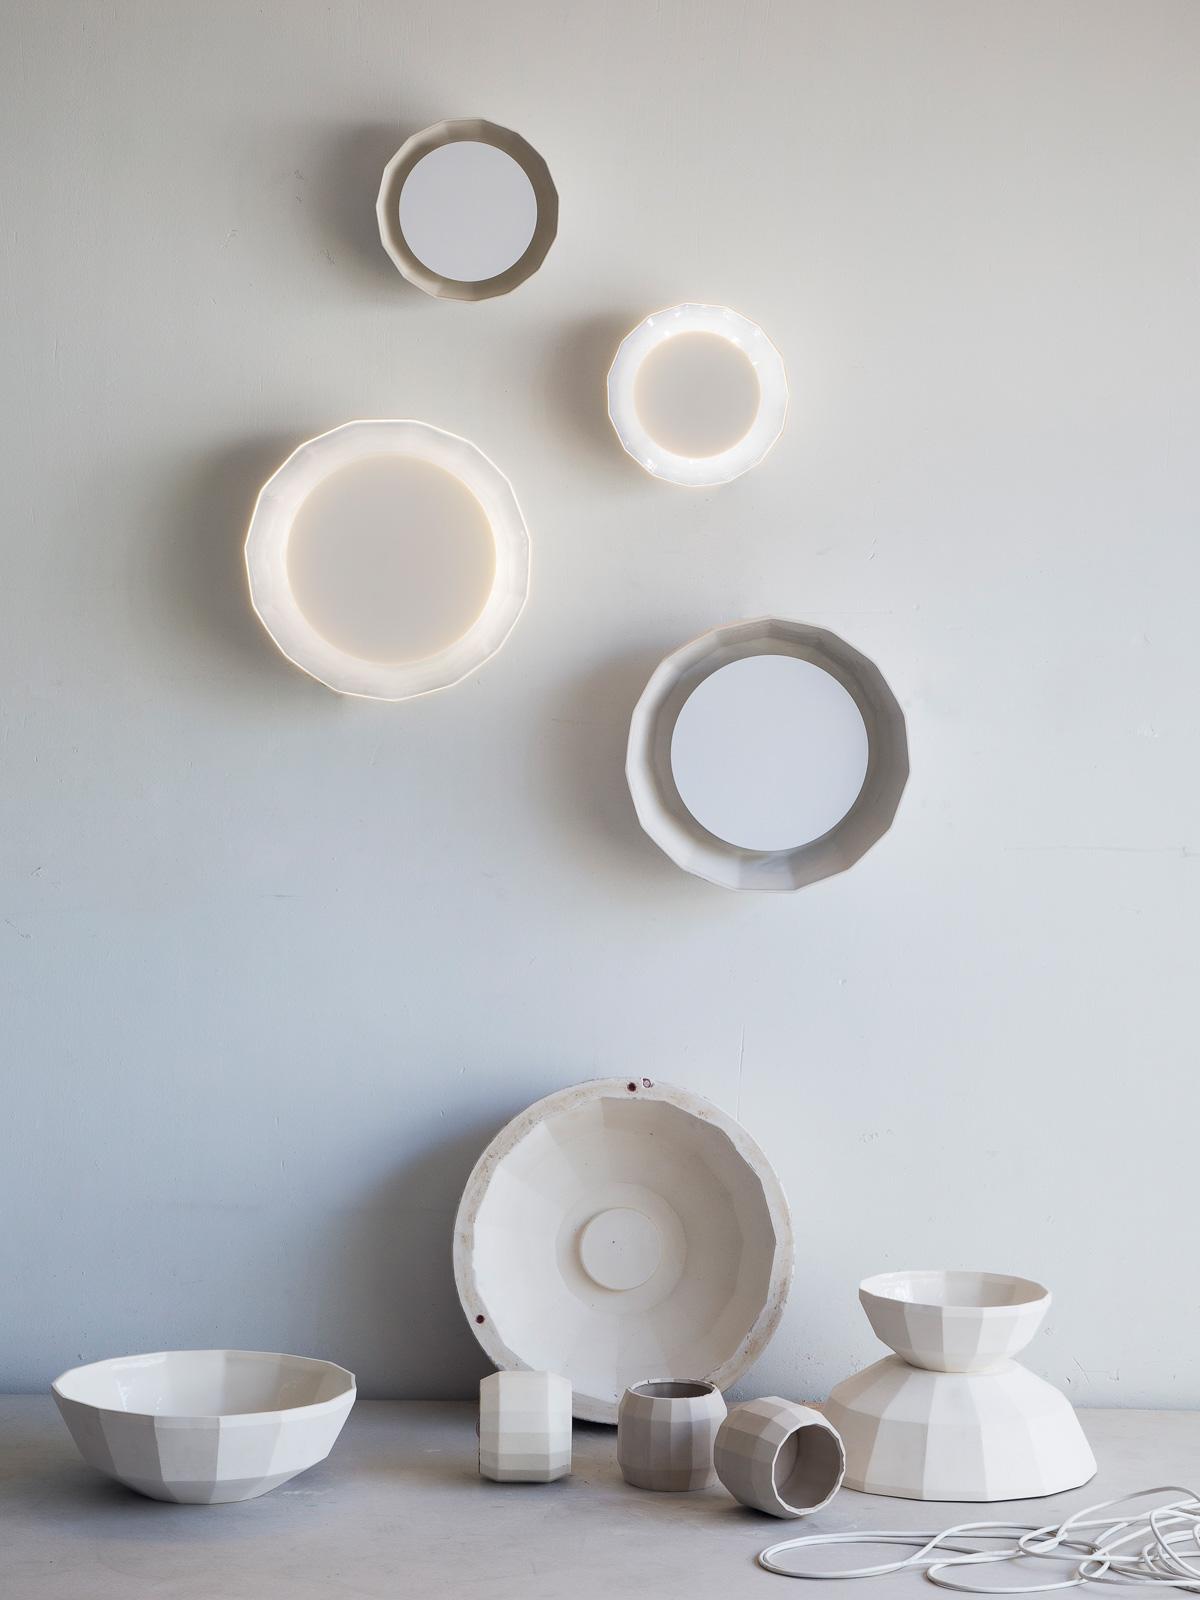 Scotch Club A Wandleuchte Keramik Marset Designort Onlineshop Lampen